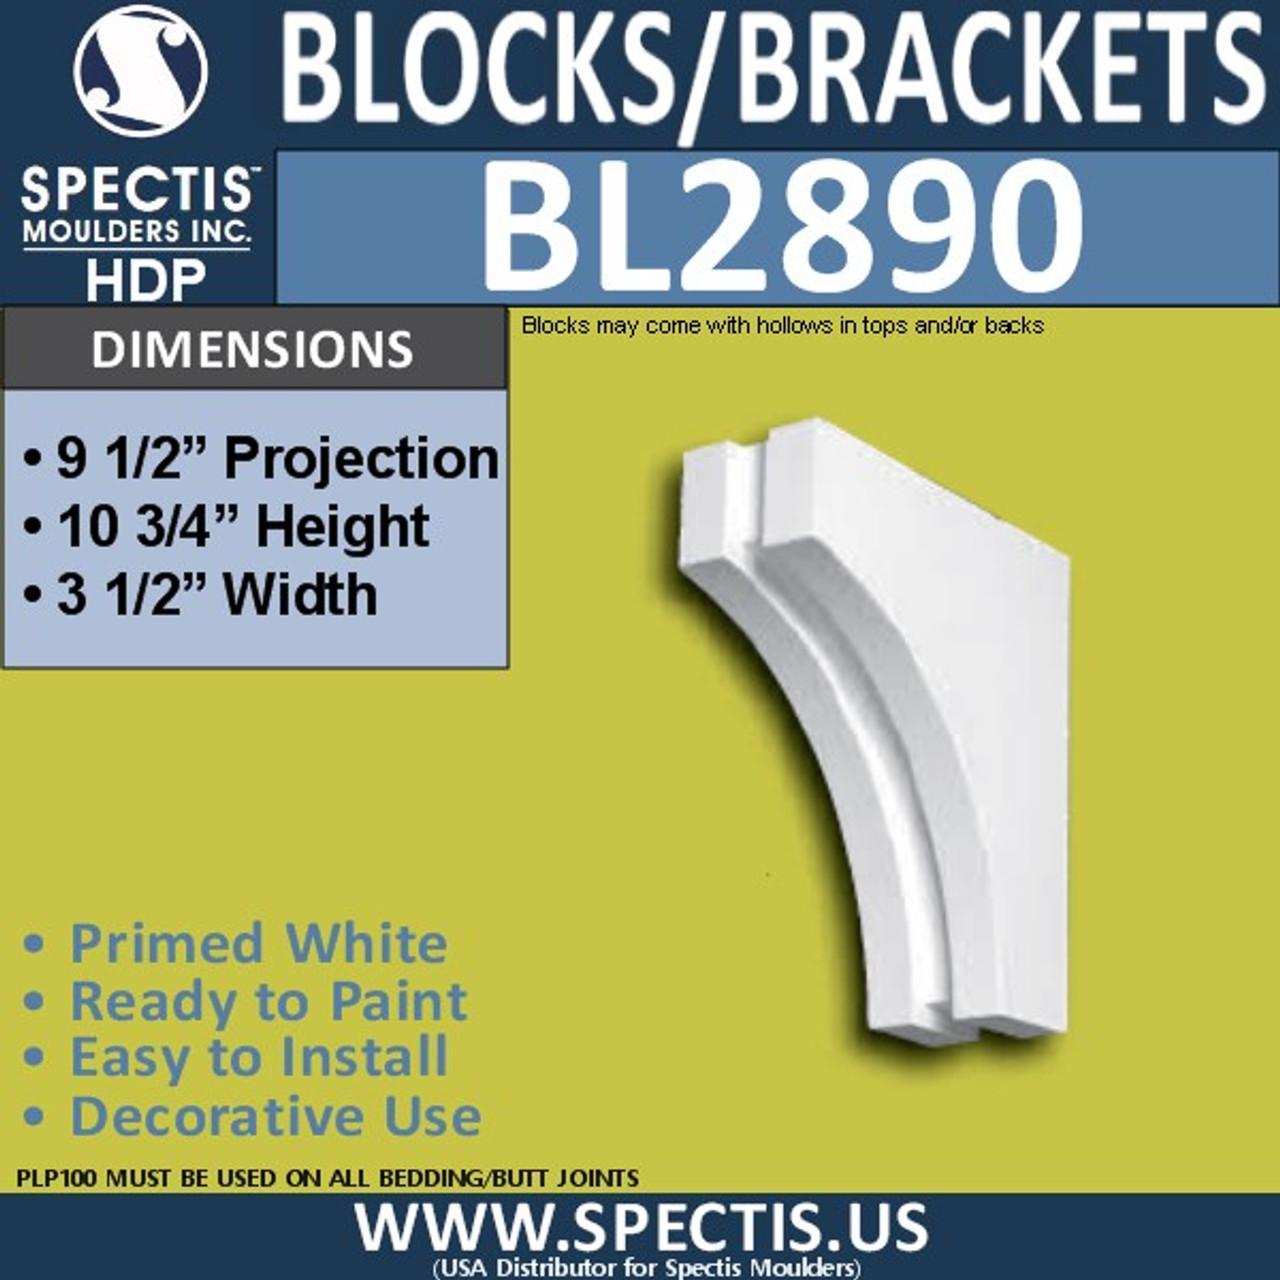 "BL2890 Eave Block or Bracket 3.5""W x 10.75""H x 9.5"" P"